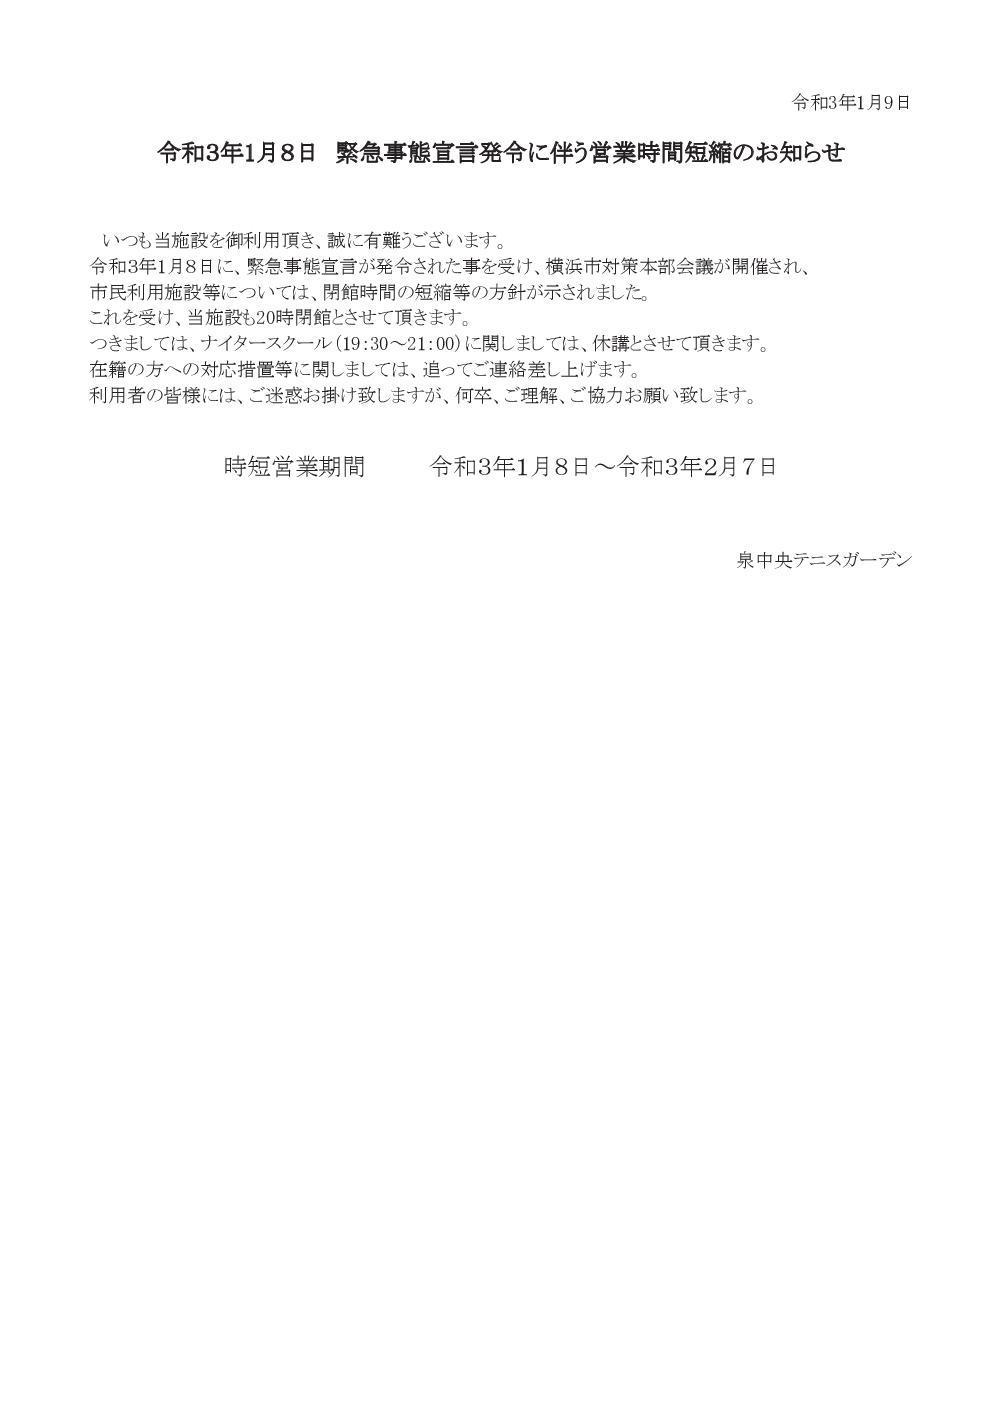 .jpg - 緊急事態宣言発令に伴う営業時間短縮のお知らせ